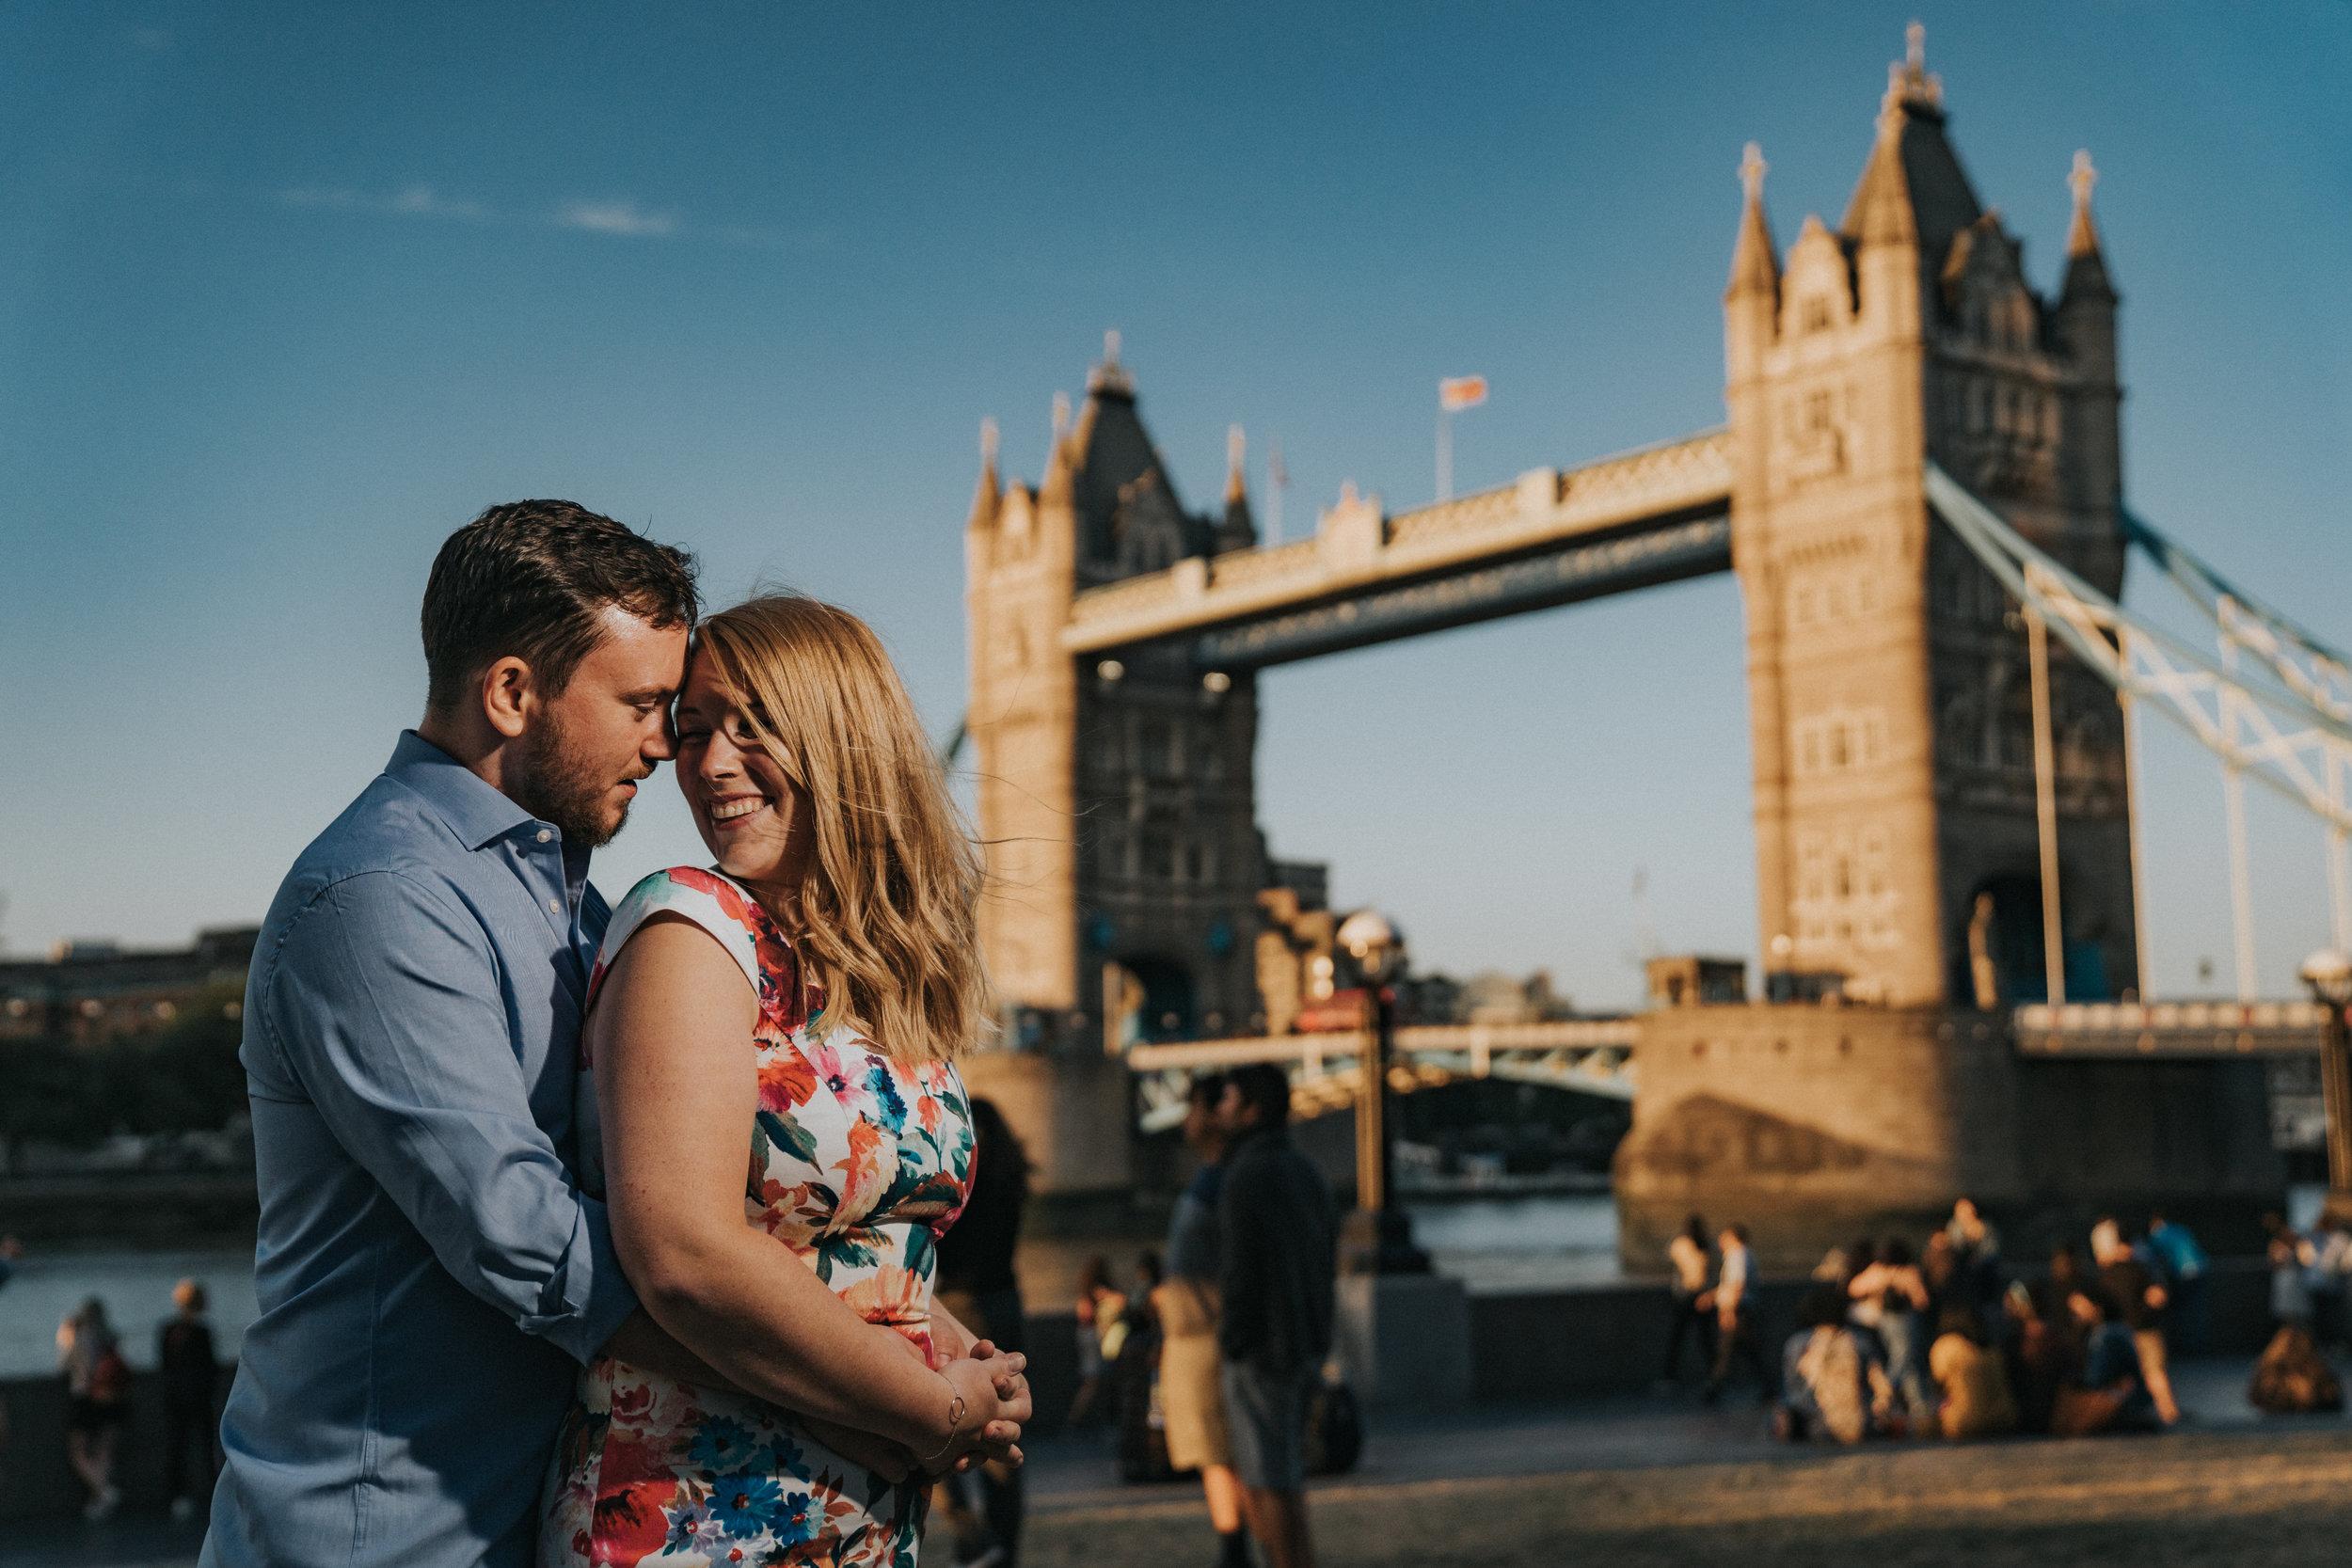 tower-bridge-engagement-wedding-london-photography-videography-12